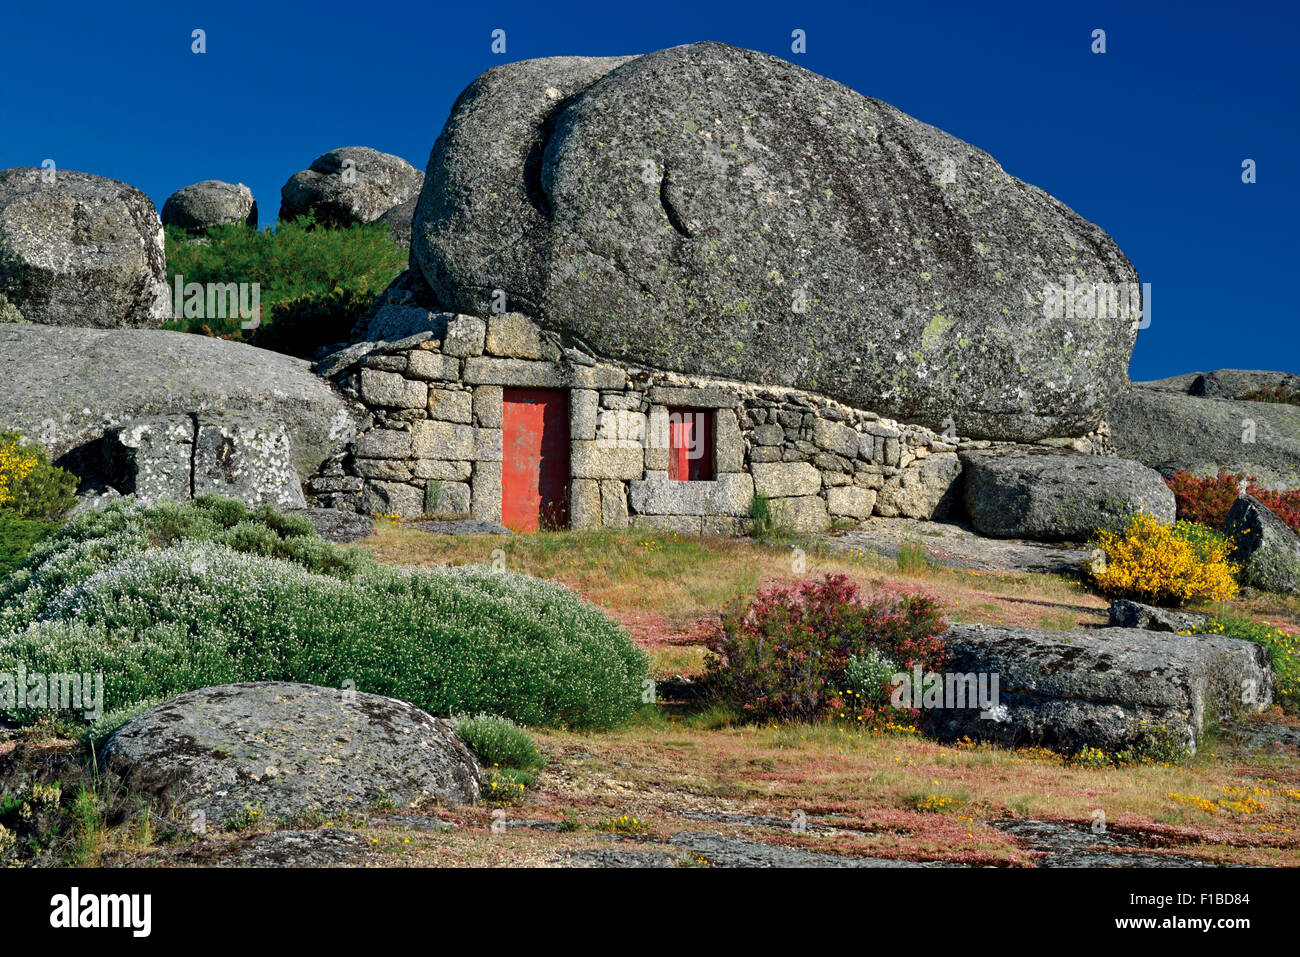 Portugal, Serra da Estrela: House under the Rocks - Stock Image